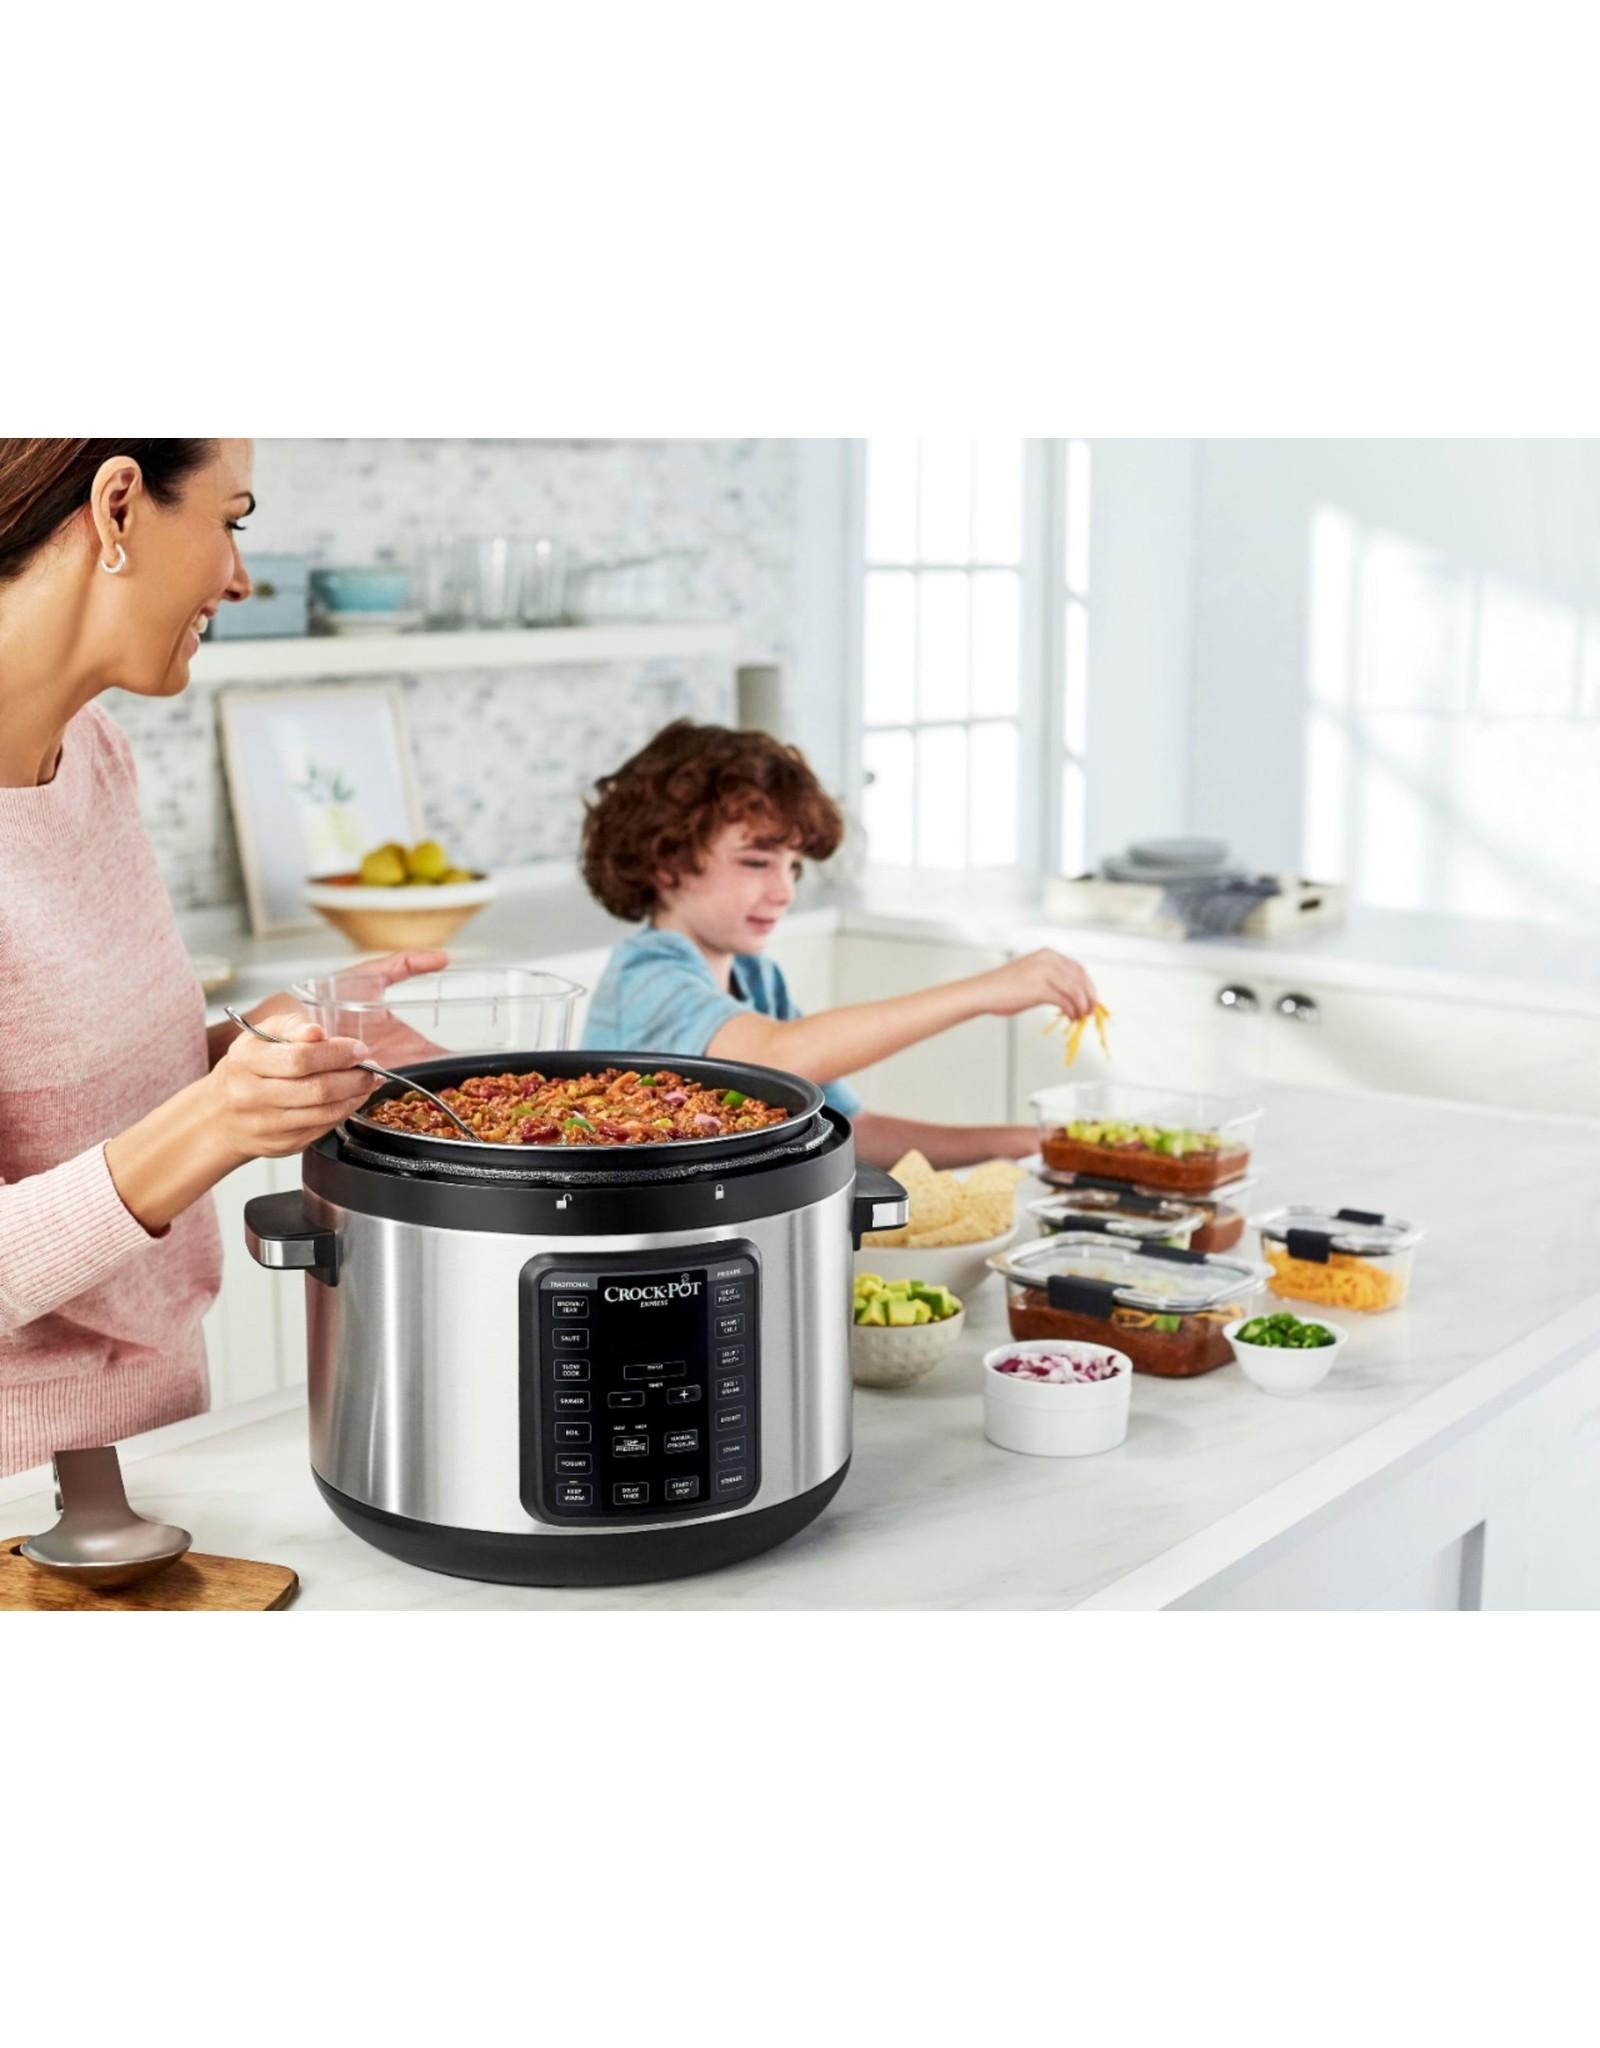 Crock-pot Crock-Pot - 10qt Digital Multi Cooker - Stainless Steel